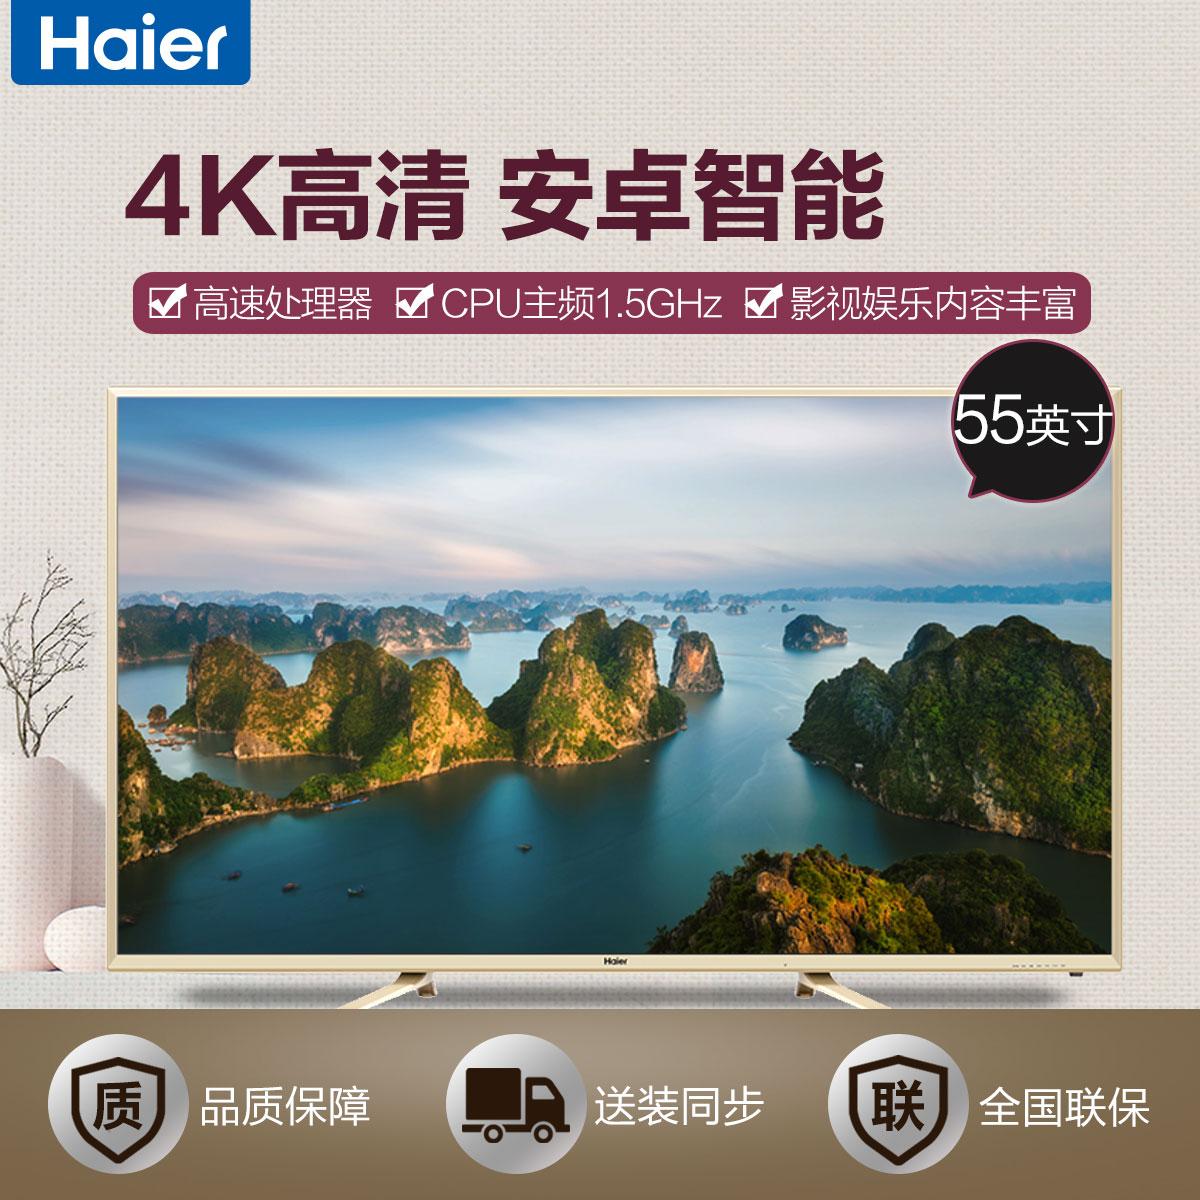 Haier/海尔 4K电视 LS55A51